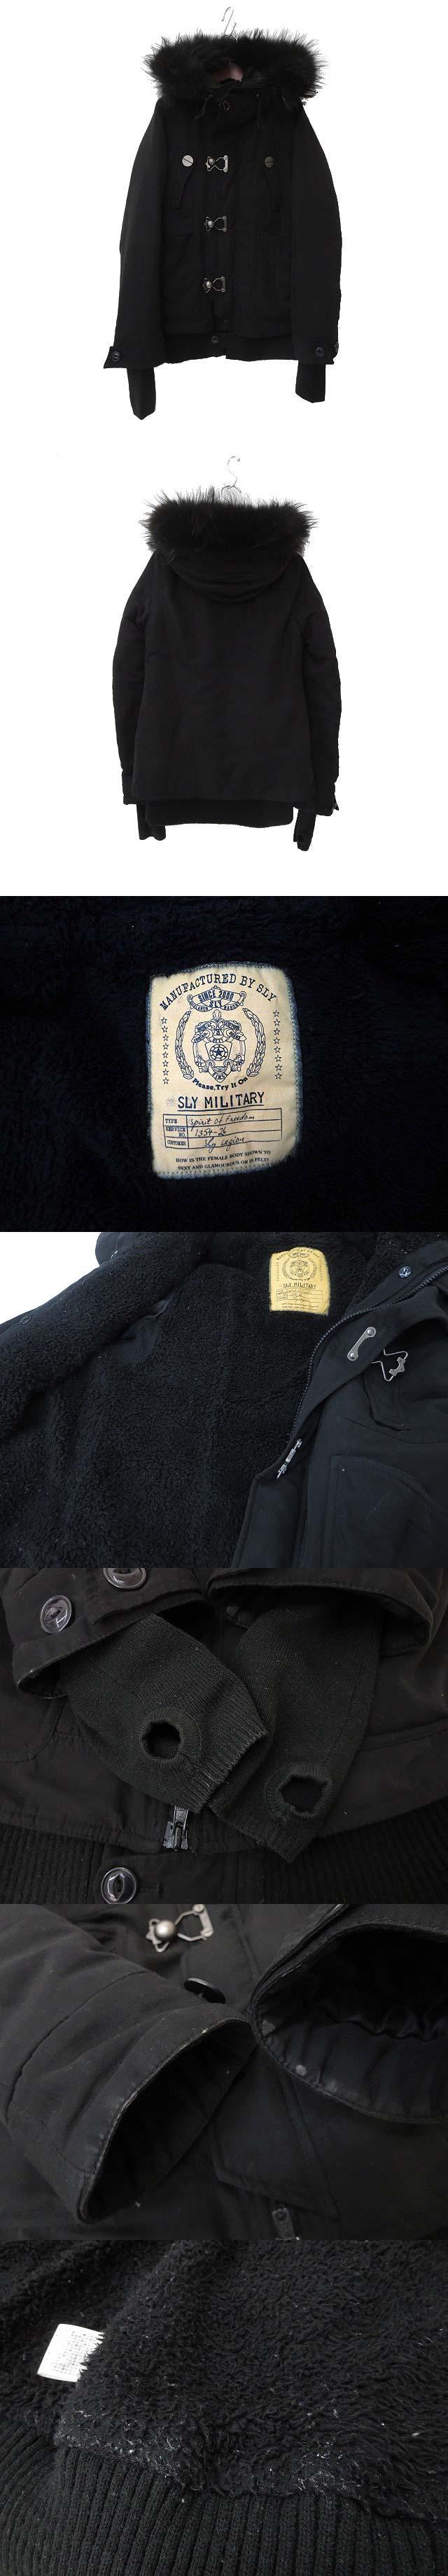 SLY スライ ラクーンファー ライナー付 ジップアップ フィンガーホール 中綿 ミリタリー モッズ コート 1 ブラック